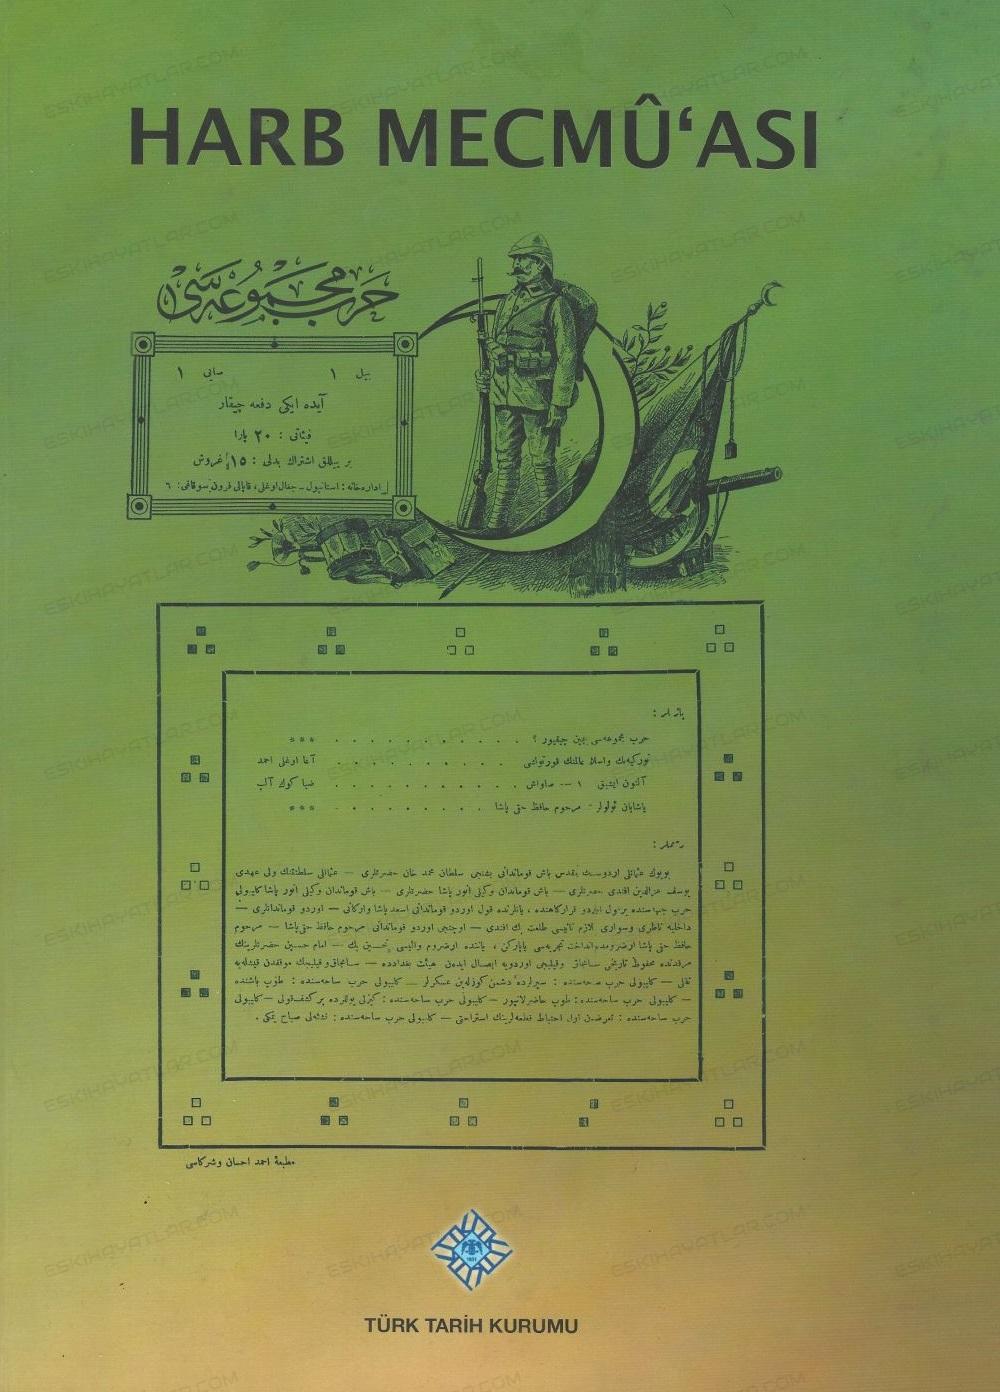 0490-harb-mecmuasi-kasim-1915-haziran-1918-turk-tarih-vakfi (1)